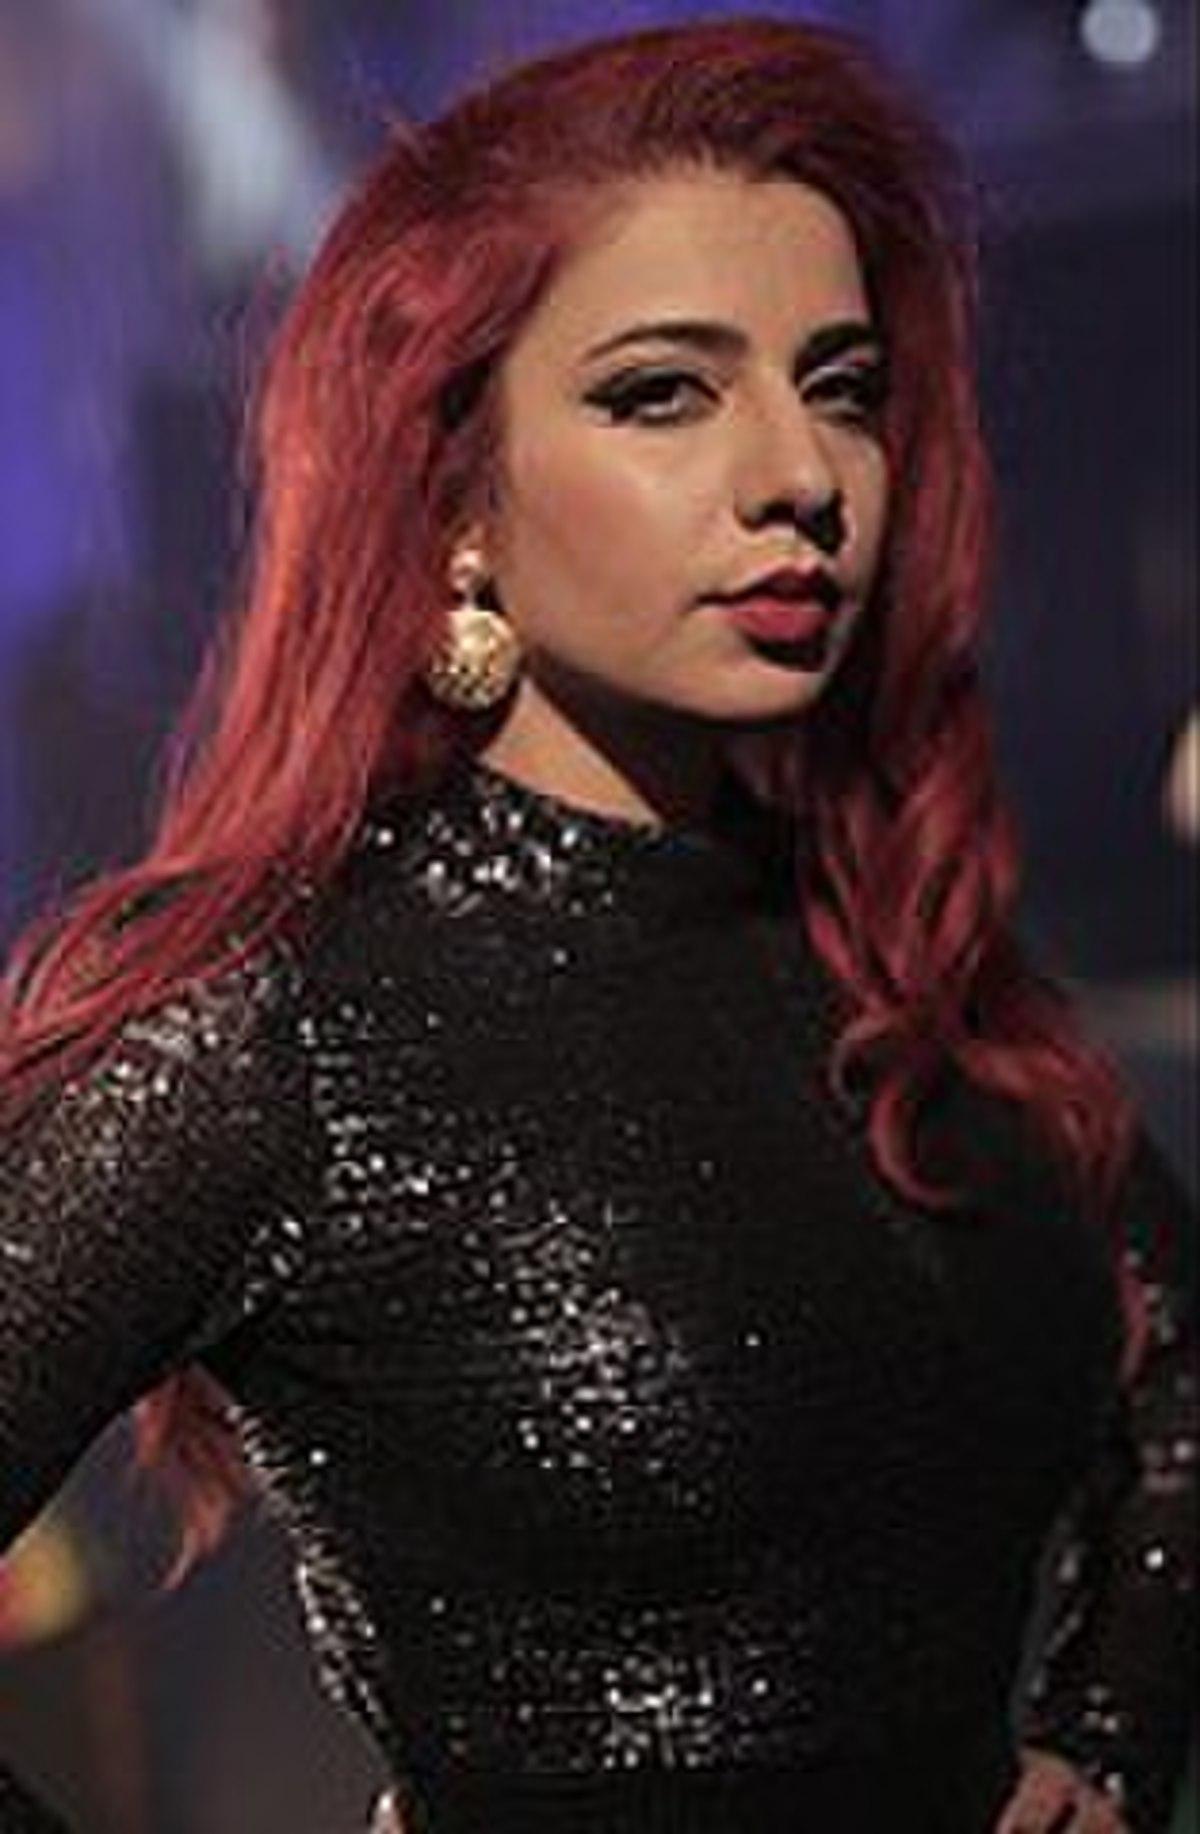 Muskan Girl Wallpaper Jasmine Sandlas Wikipedia